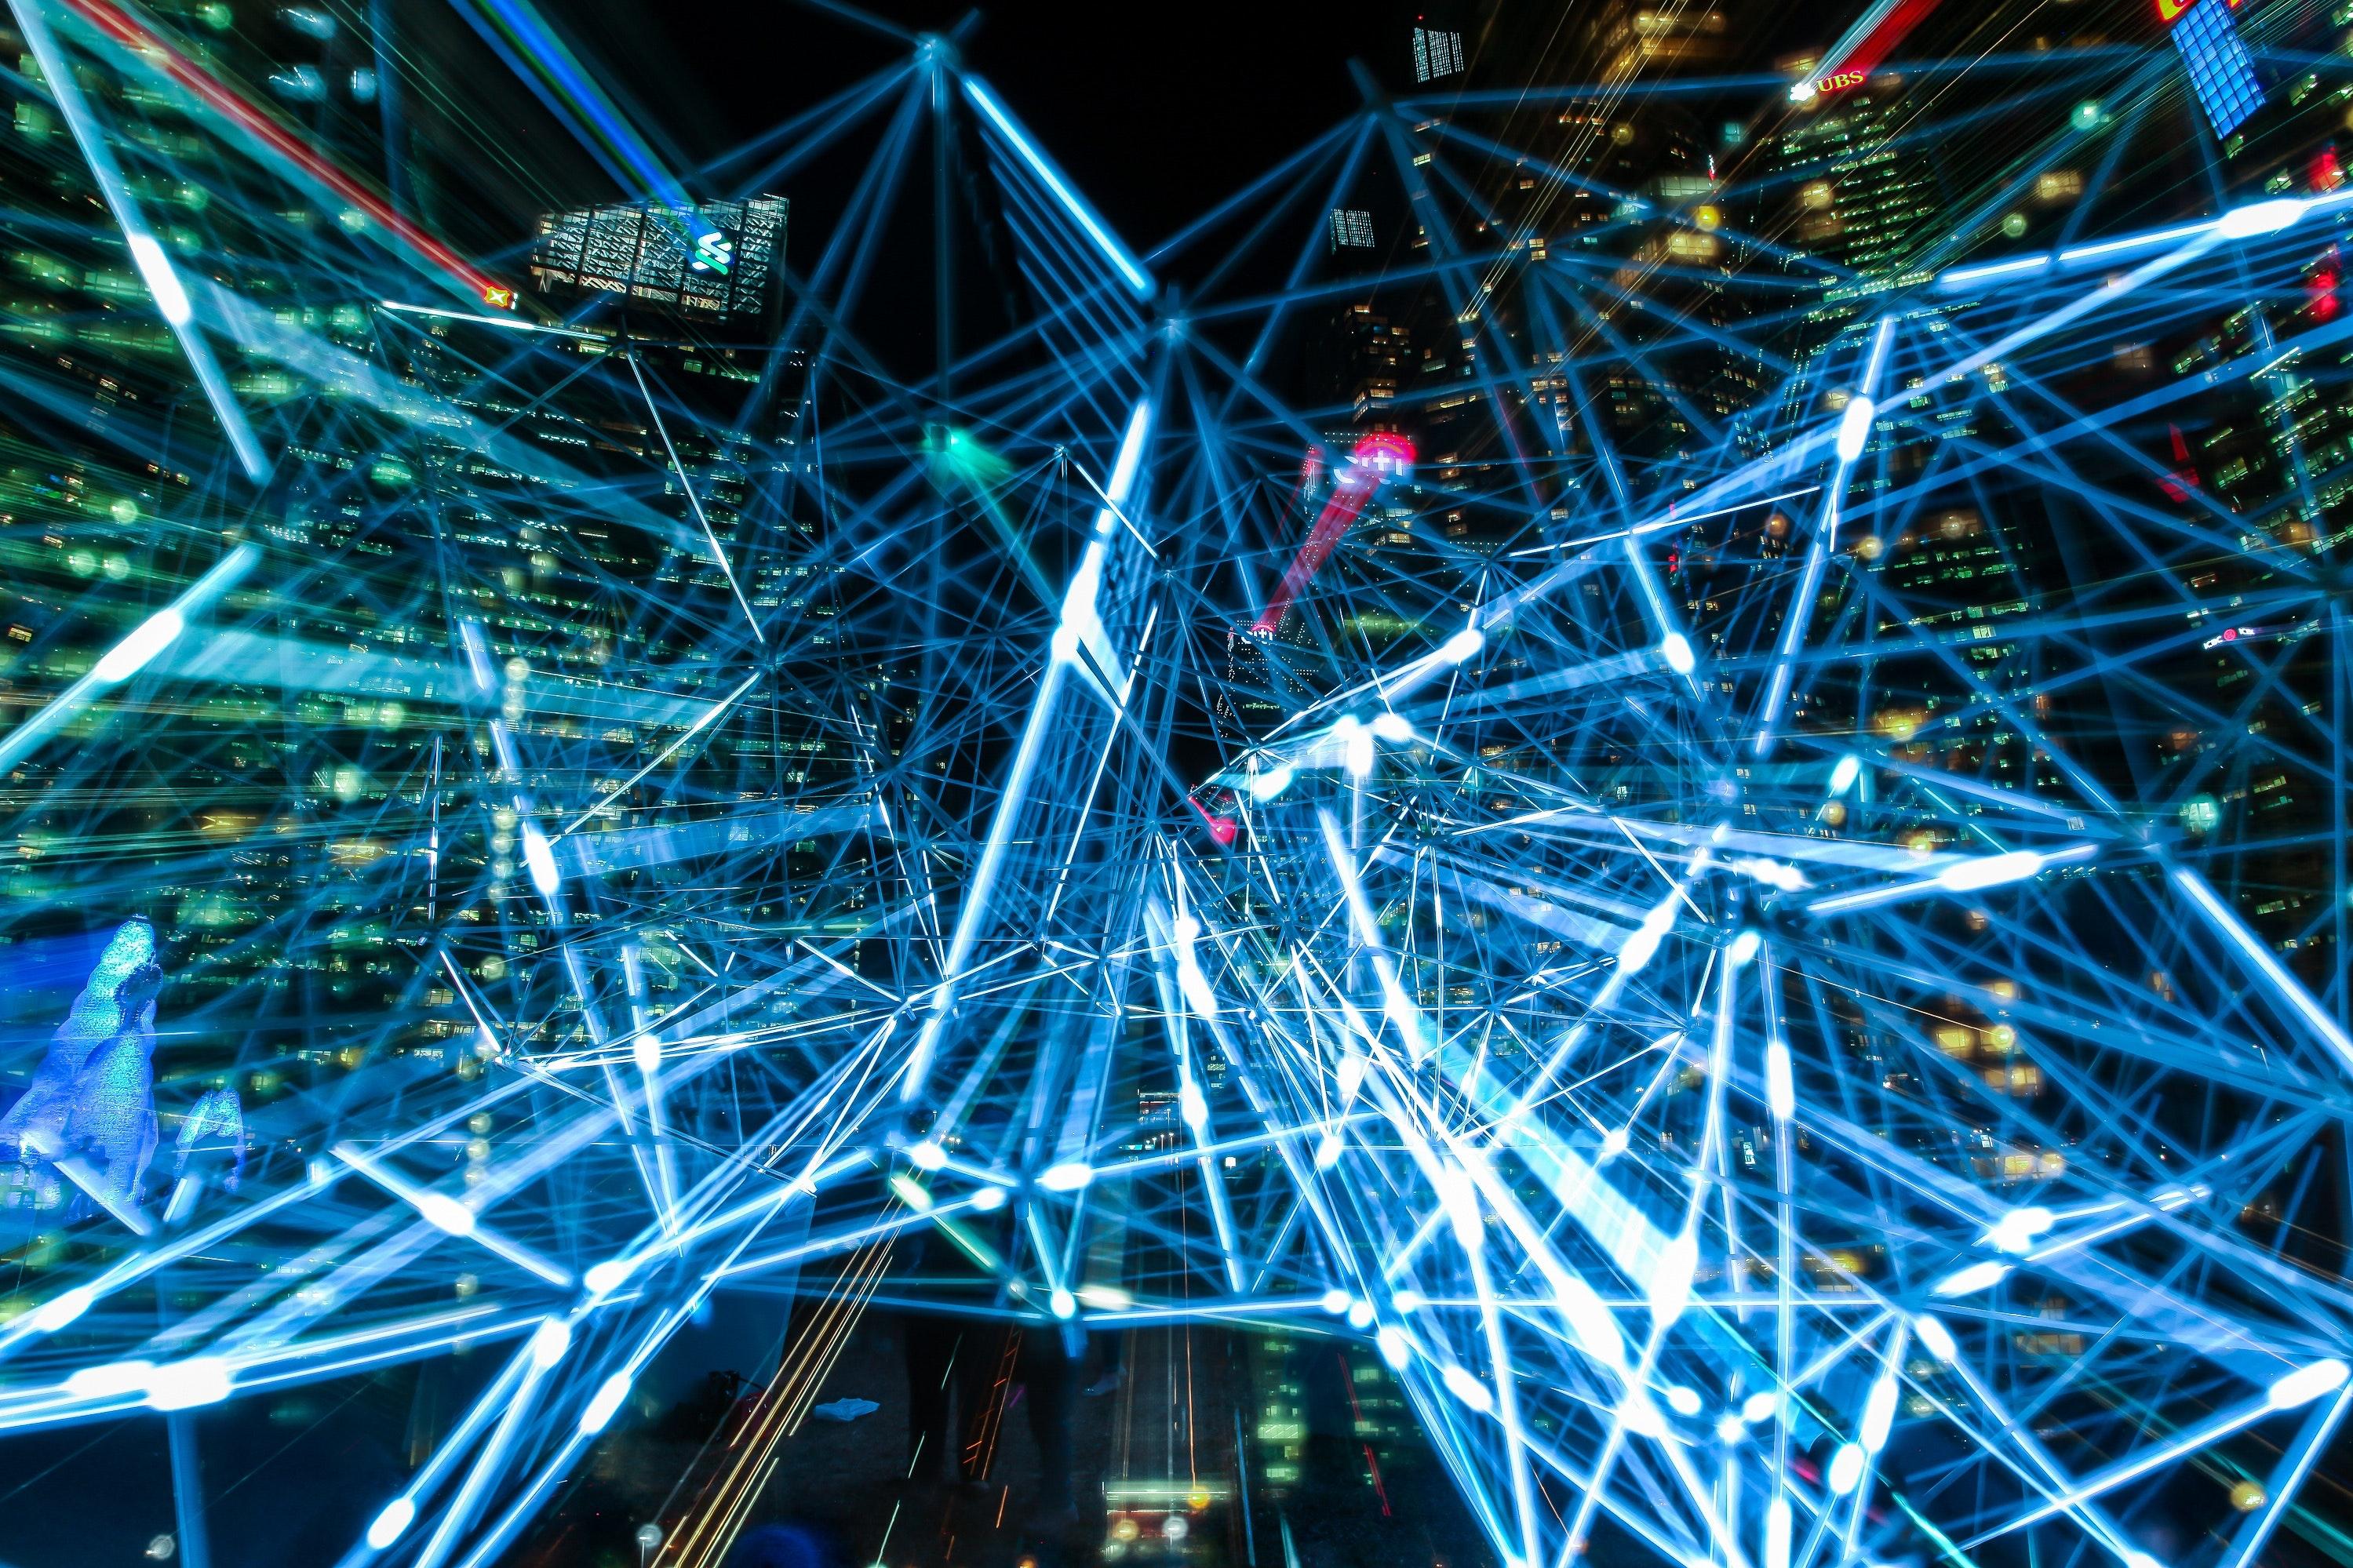 Devrim Niteliğinde Teknoloji: Yapay Zeka